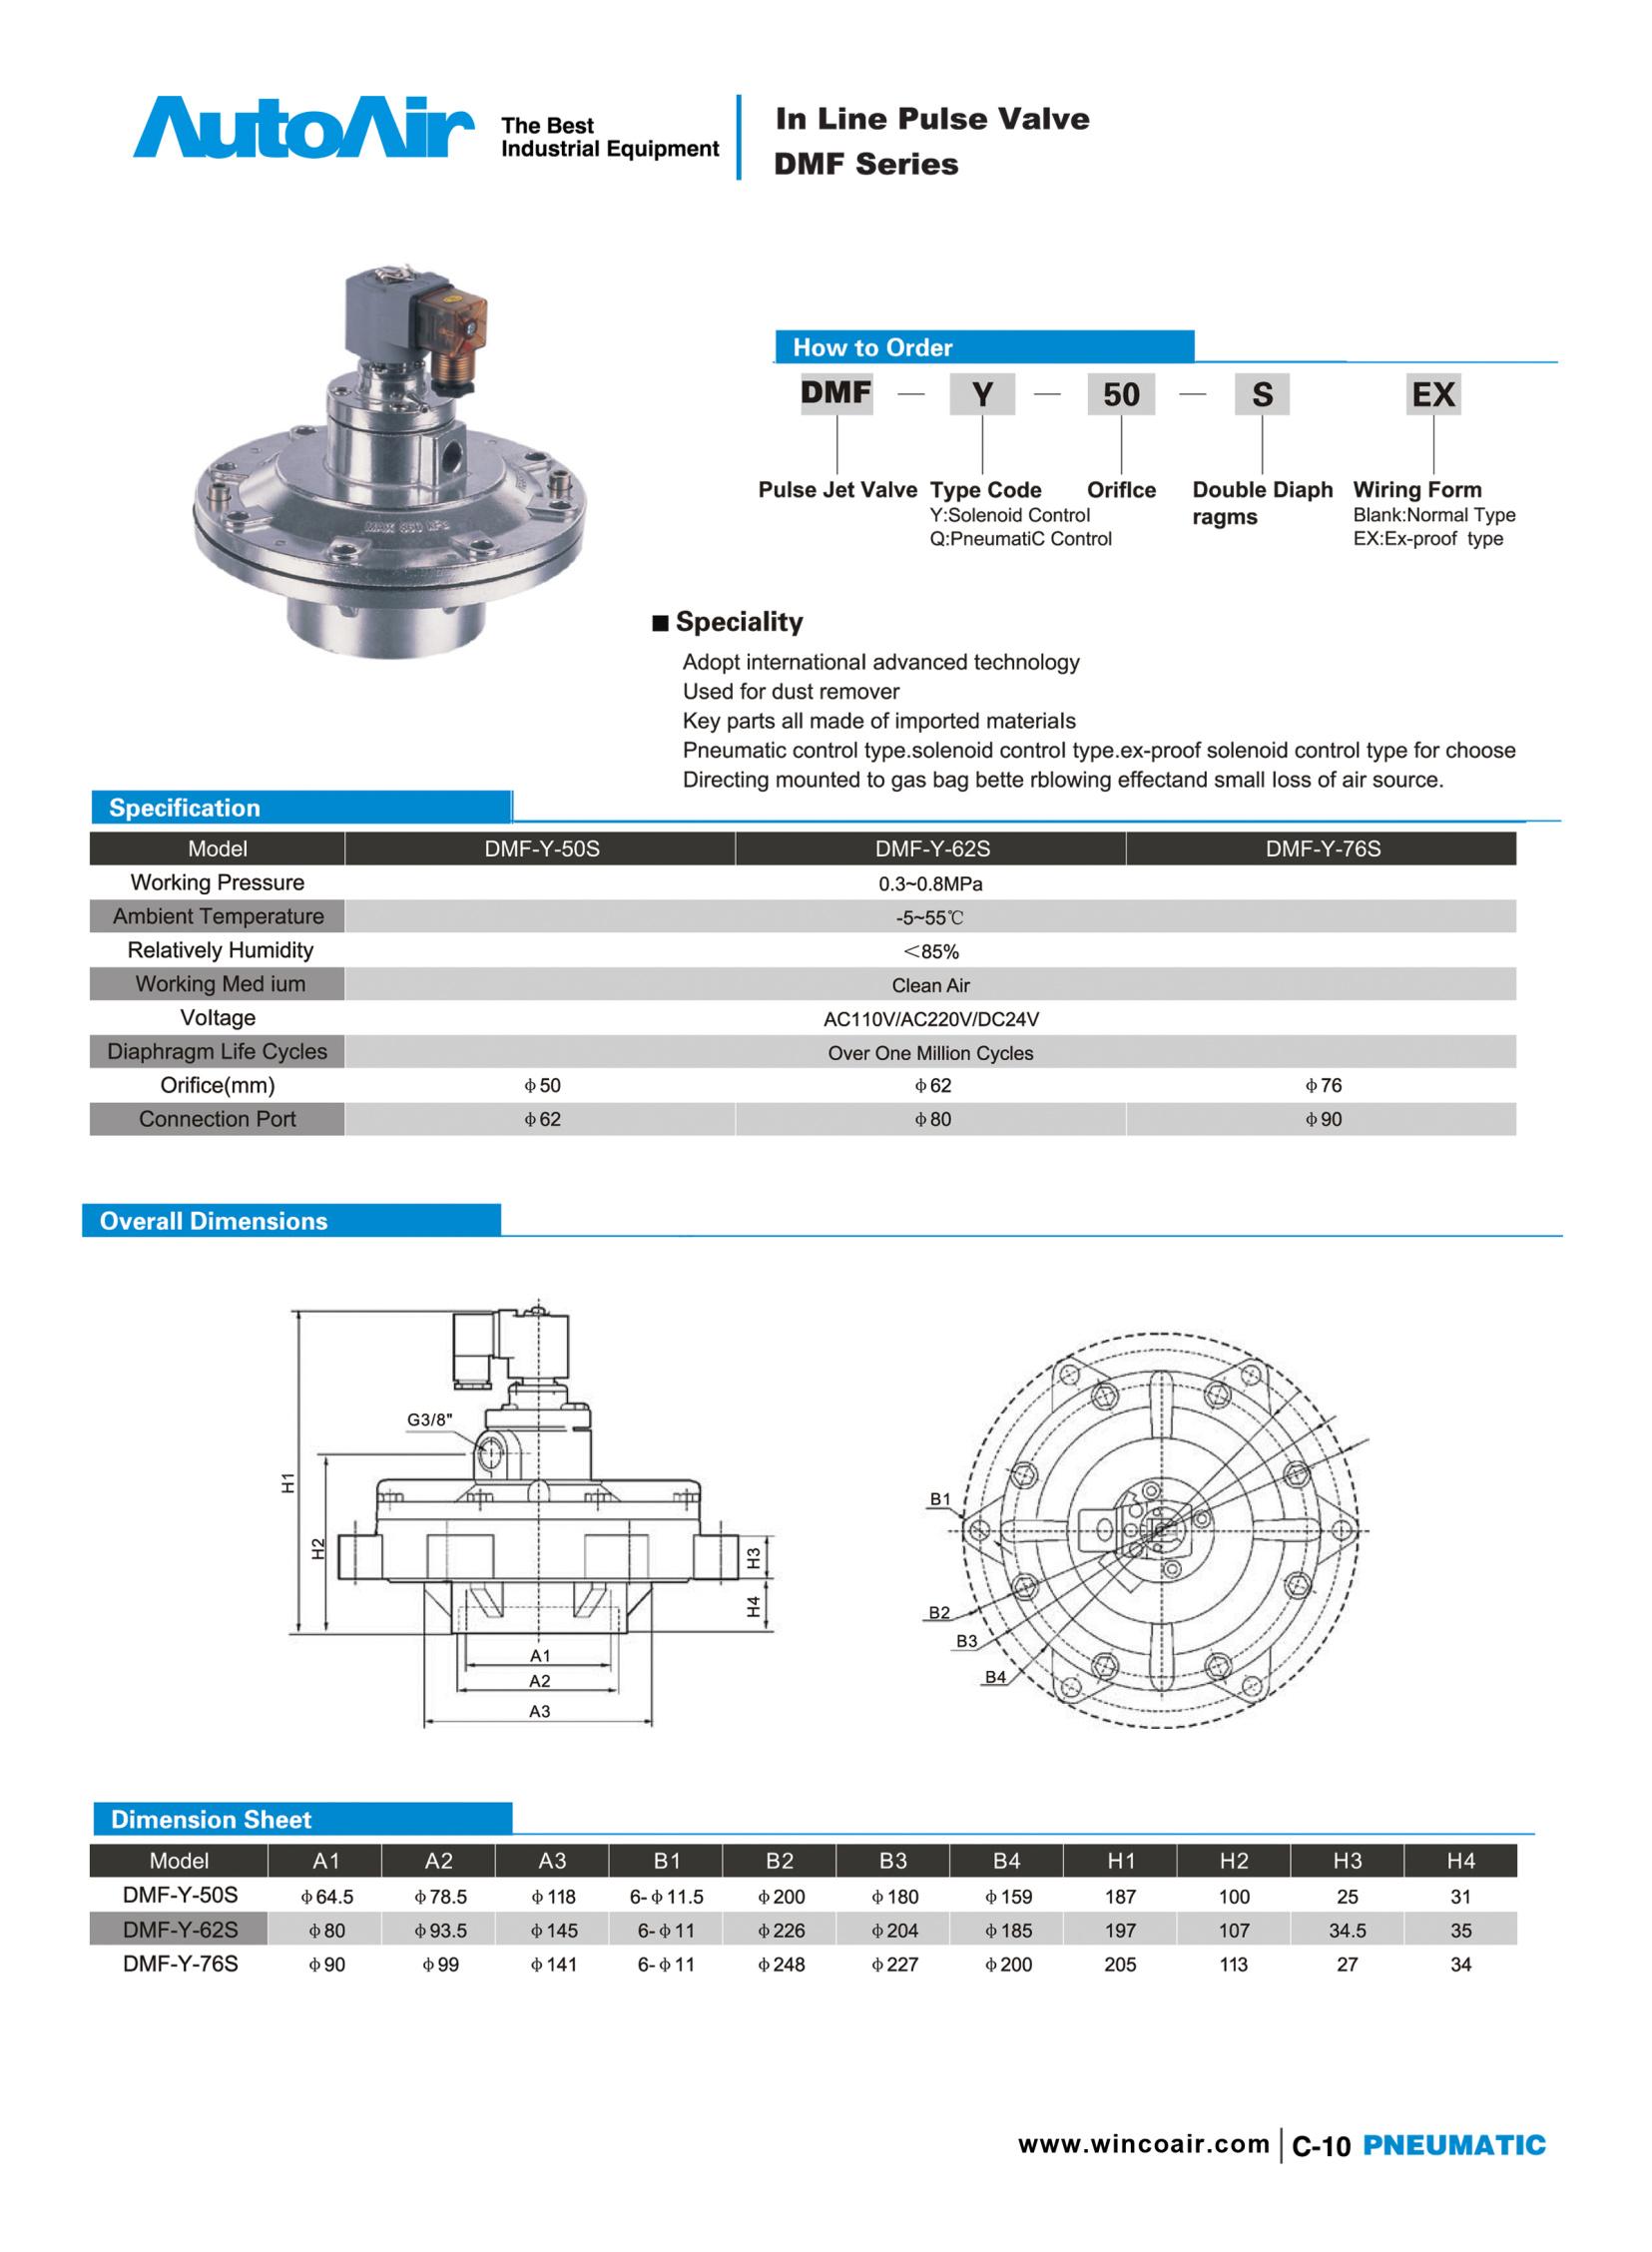 water valve(10)